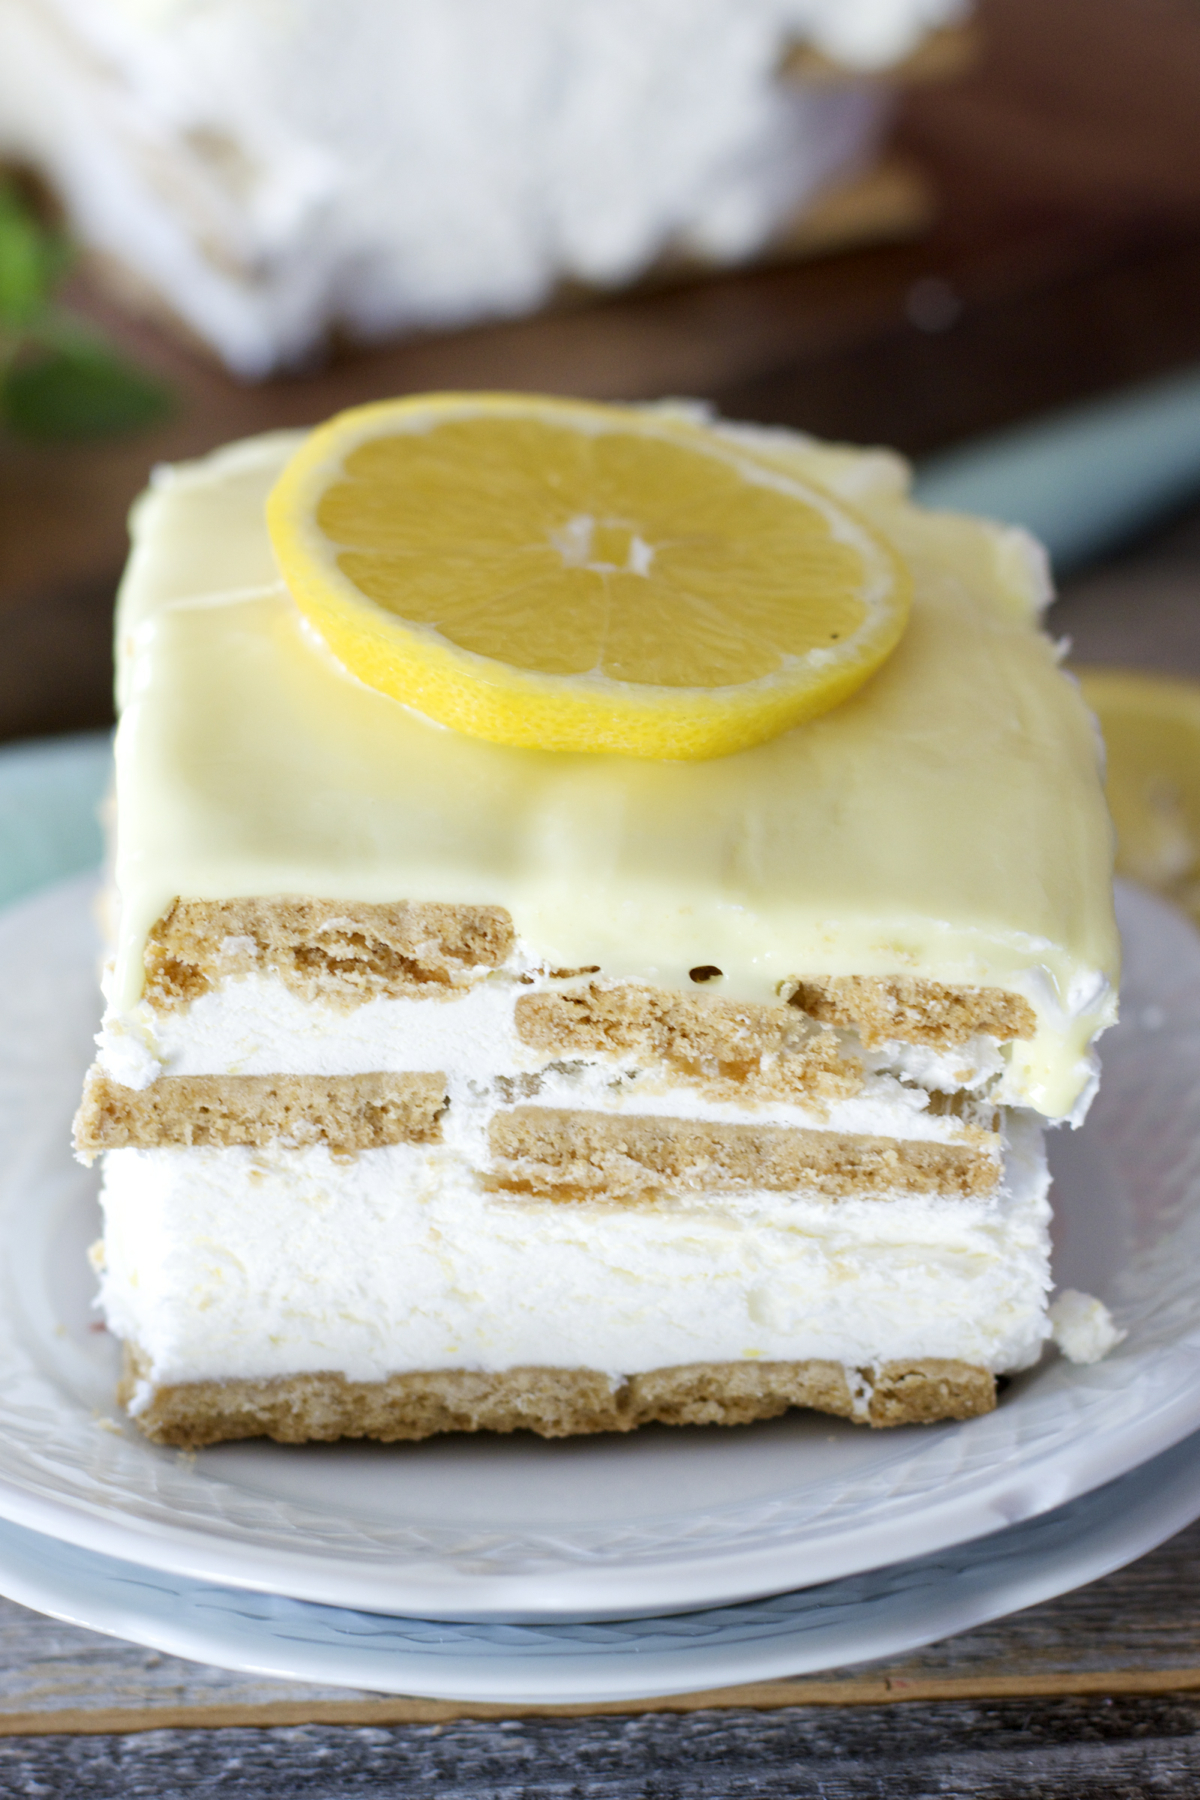 A slice of lemon icebox cake on a dessert plate.